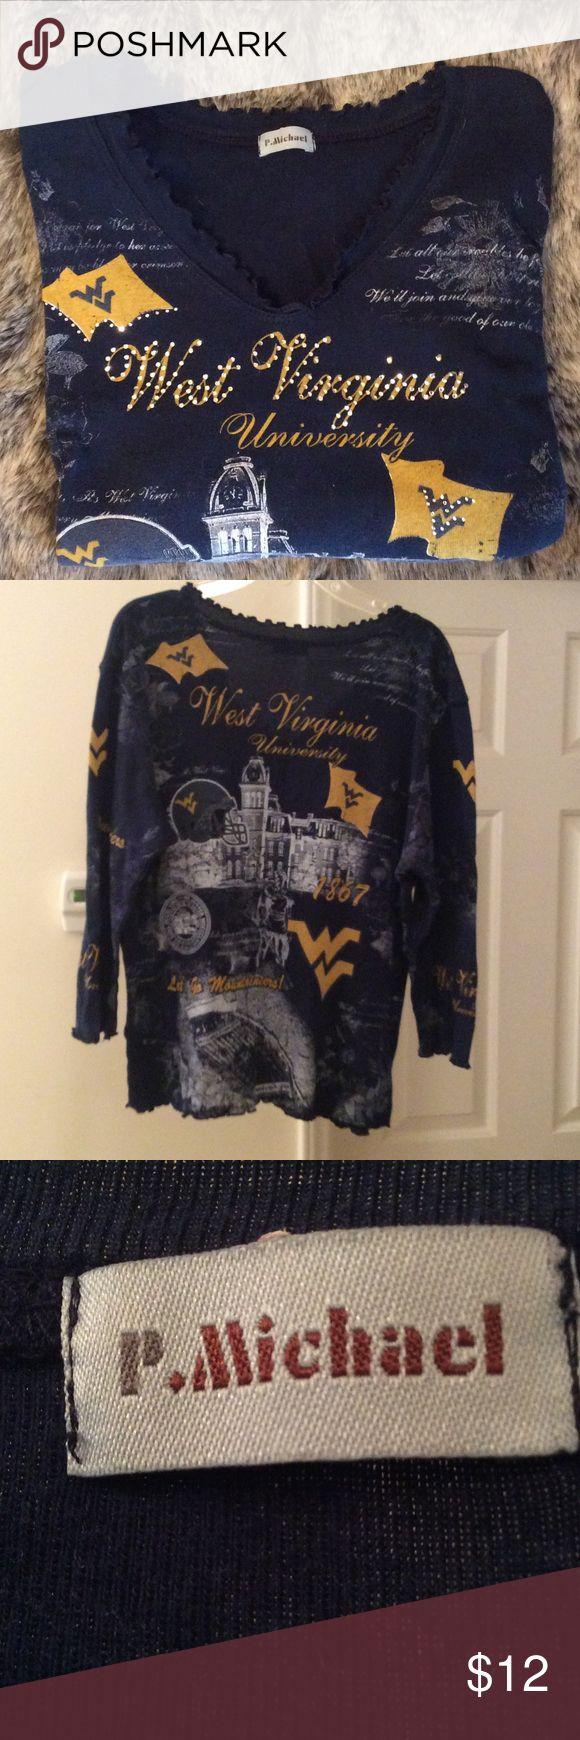 West Virgina University shirt Never worn ruffled WVU college longs sleeve tshirt P. Michael Tops Tees - Long Sleeve